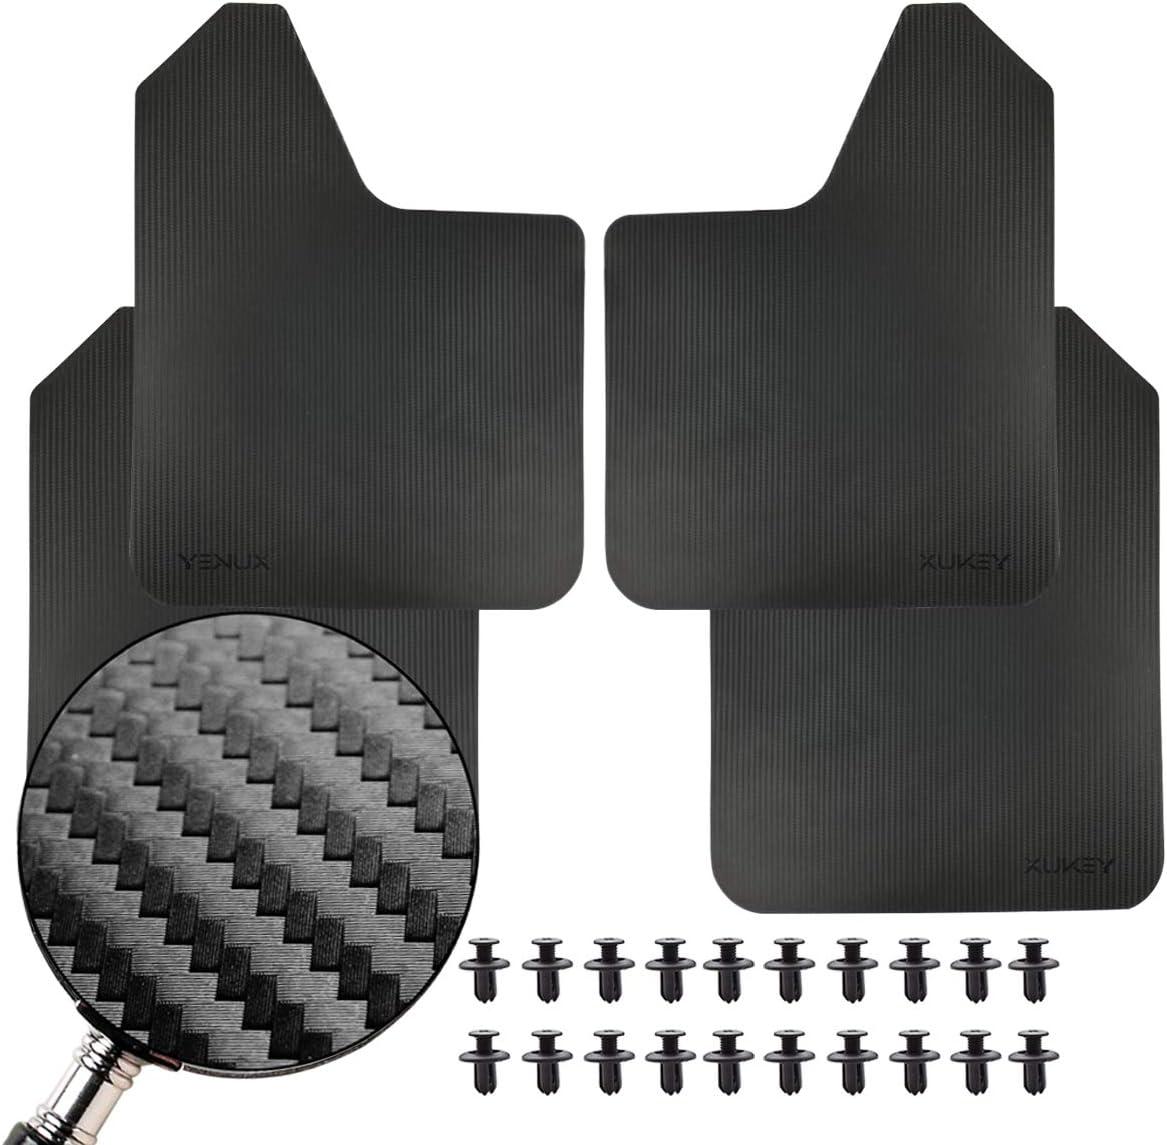 XUKEY 4pcs//Set Universal Carbon Fiber Effect Mudflaps For Car Pickup SUV Van Truck Mud Flaps Splash Guards Mudguards Dirty Traps